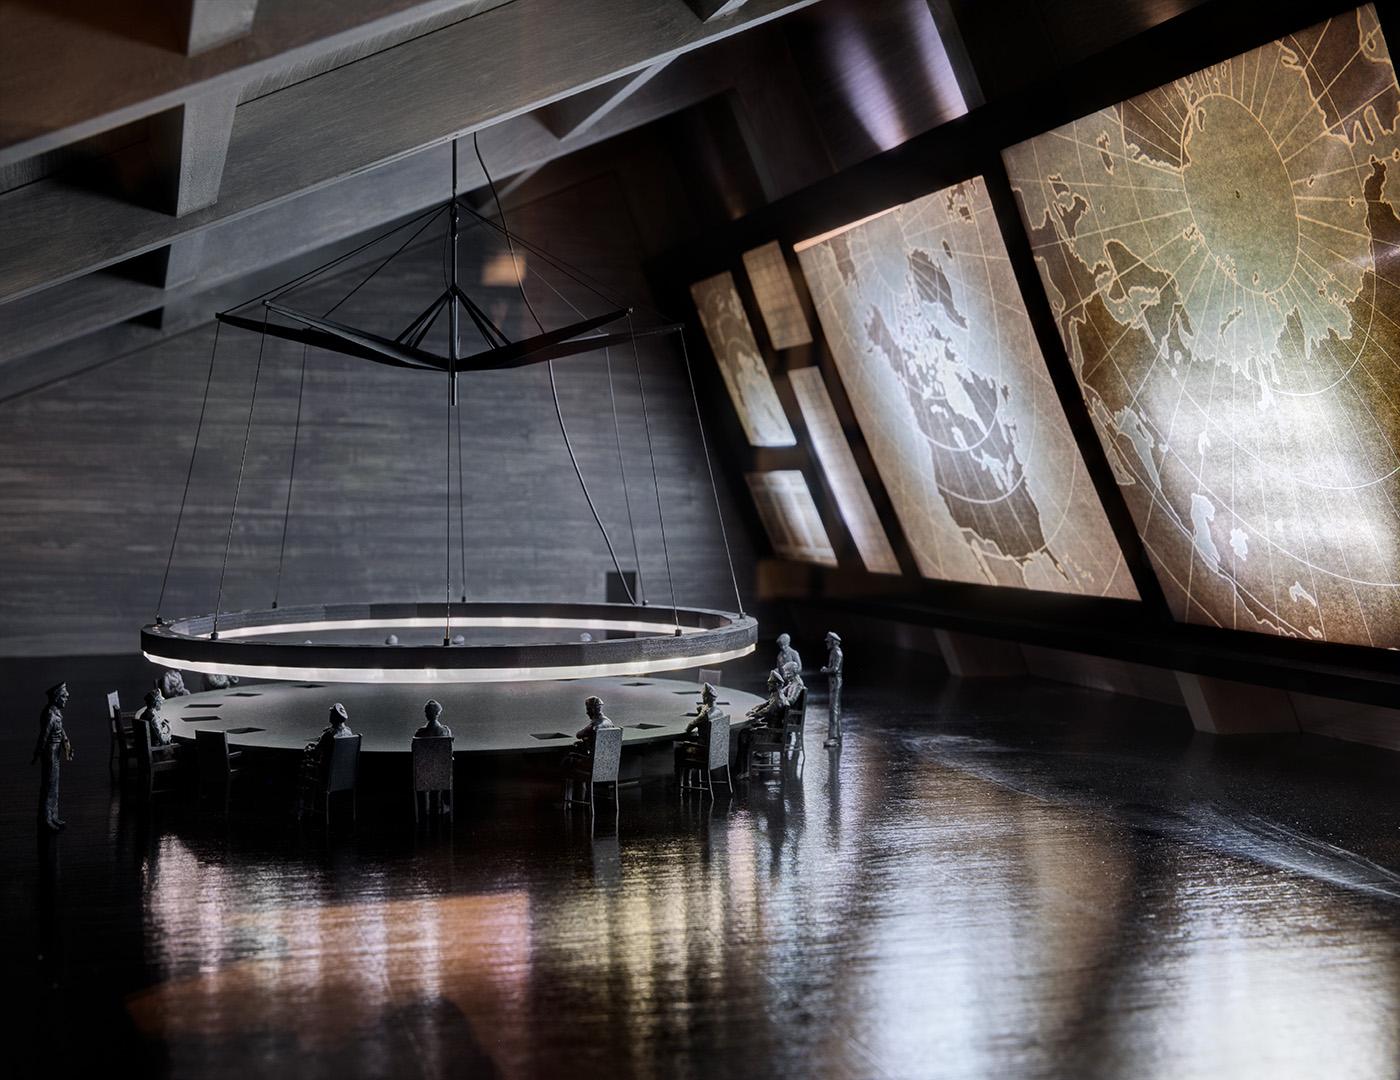 War Room model from Dr. Strangelove | © Ed Reeve for the Design Museum